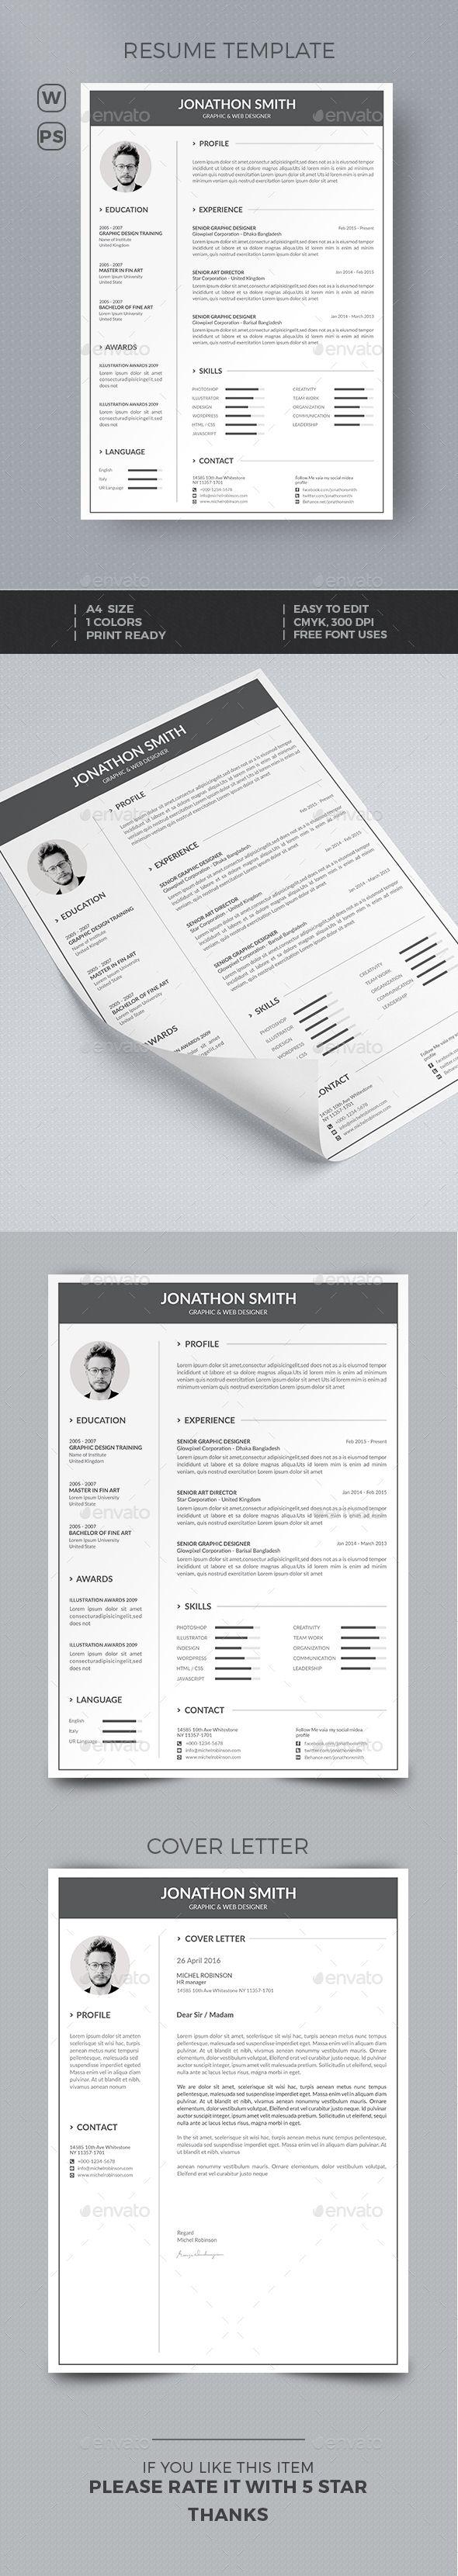 25 unique professional profile resume ideas on pinterest resume